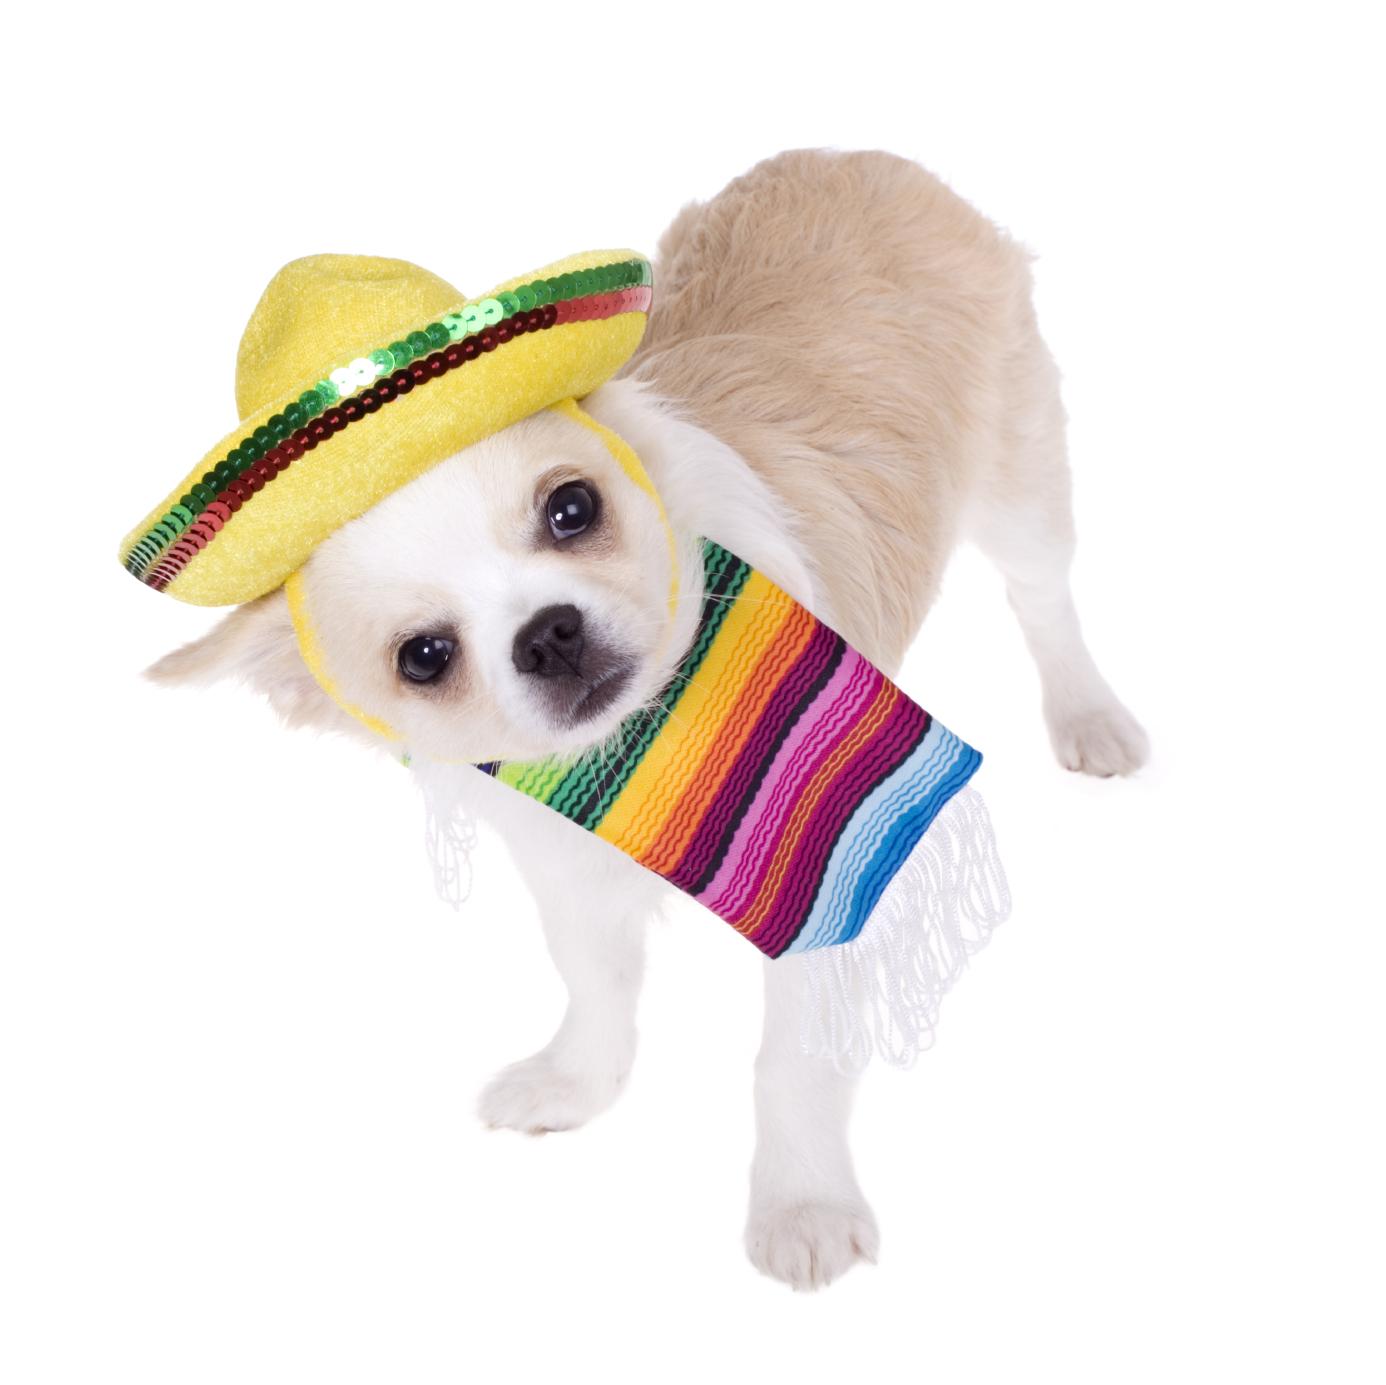 Mexican Dog Breeds: Celebrate Cinco de Mayo | Houston